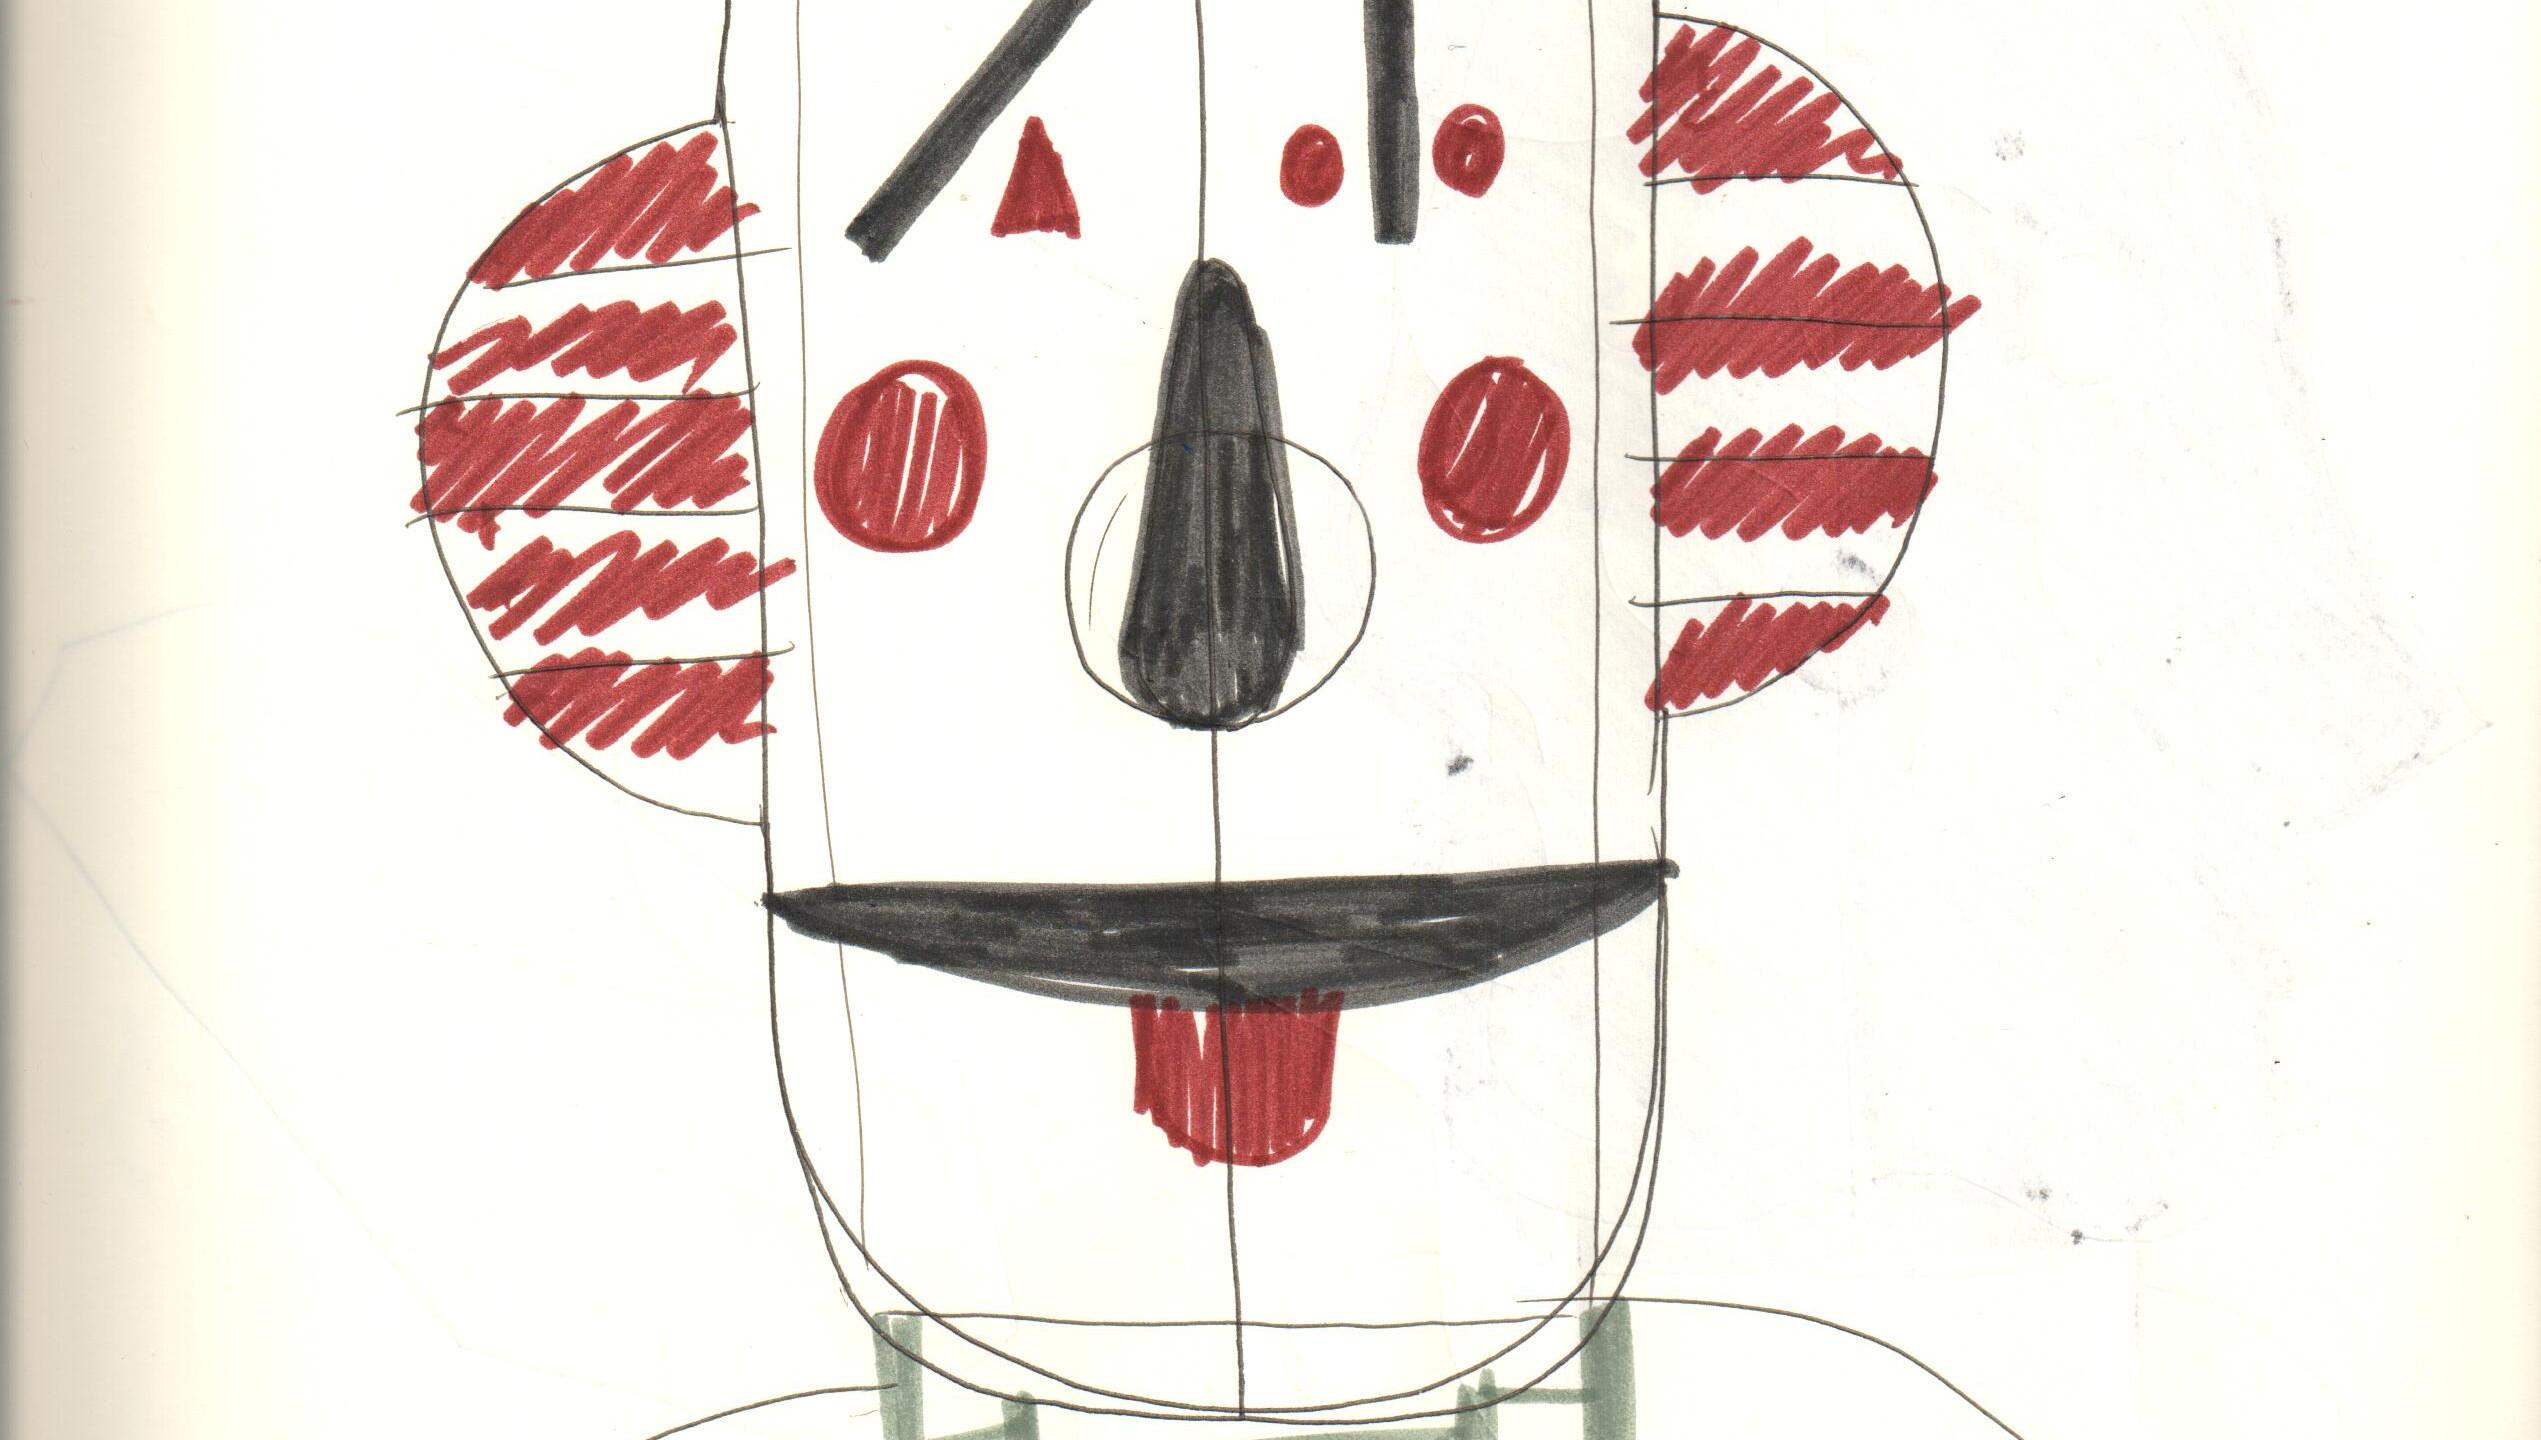 Face cabinet, sketch by Jaime Hayon - image credit to Hayon Studio